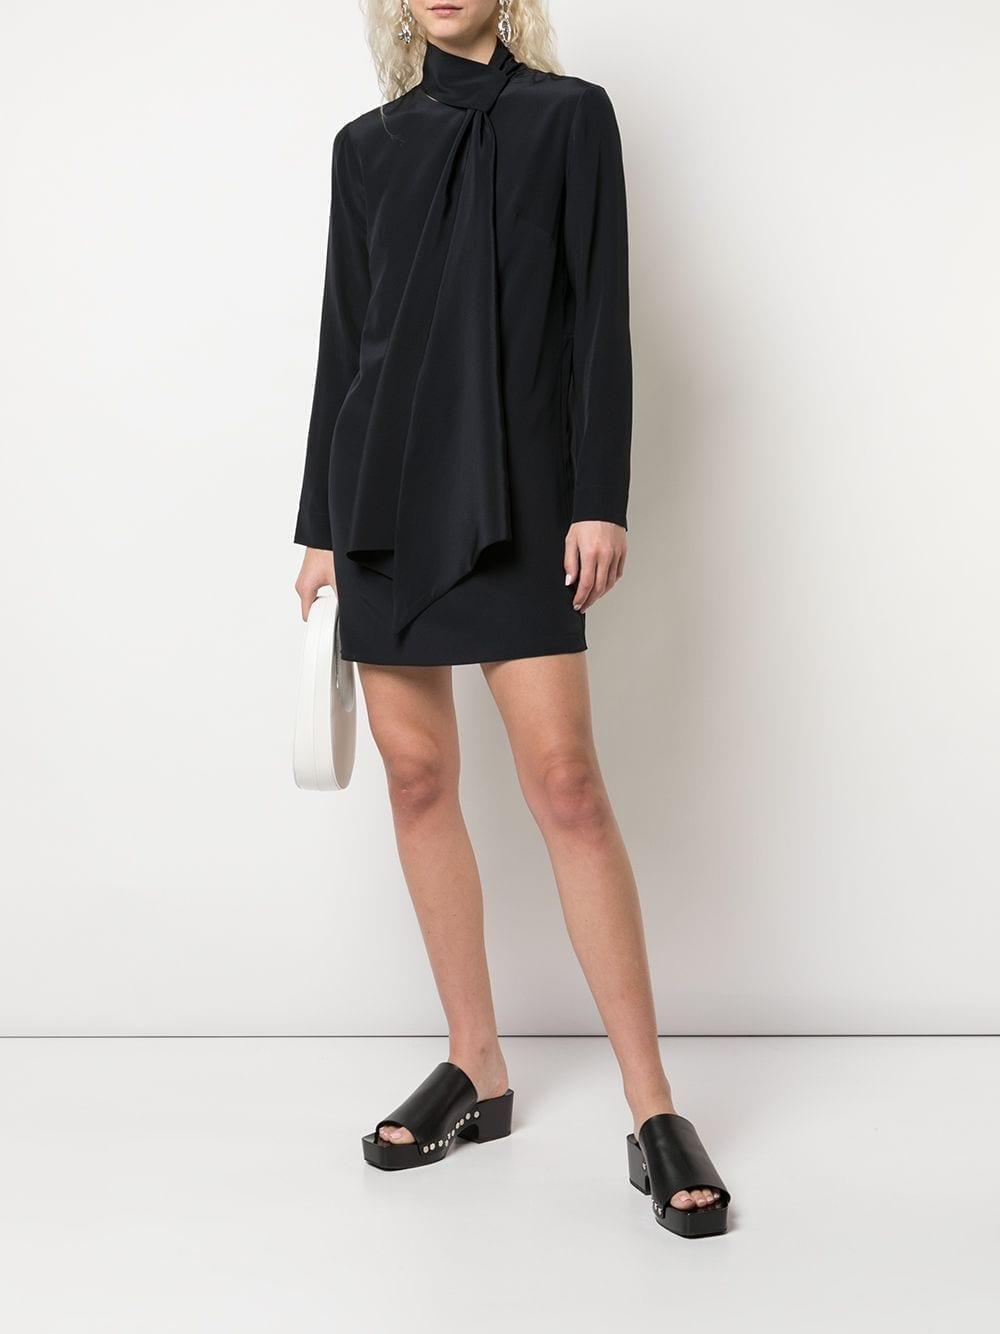 TIBI Silk Tie Neck Dolman Mini Dress